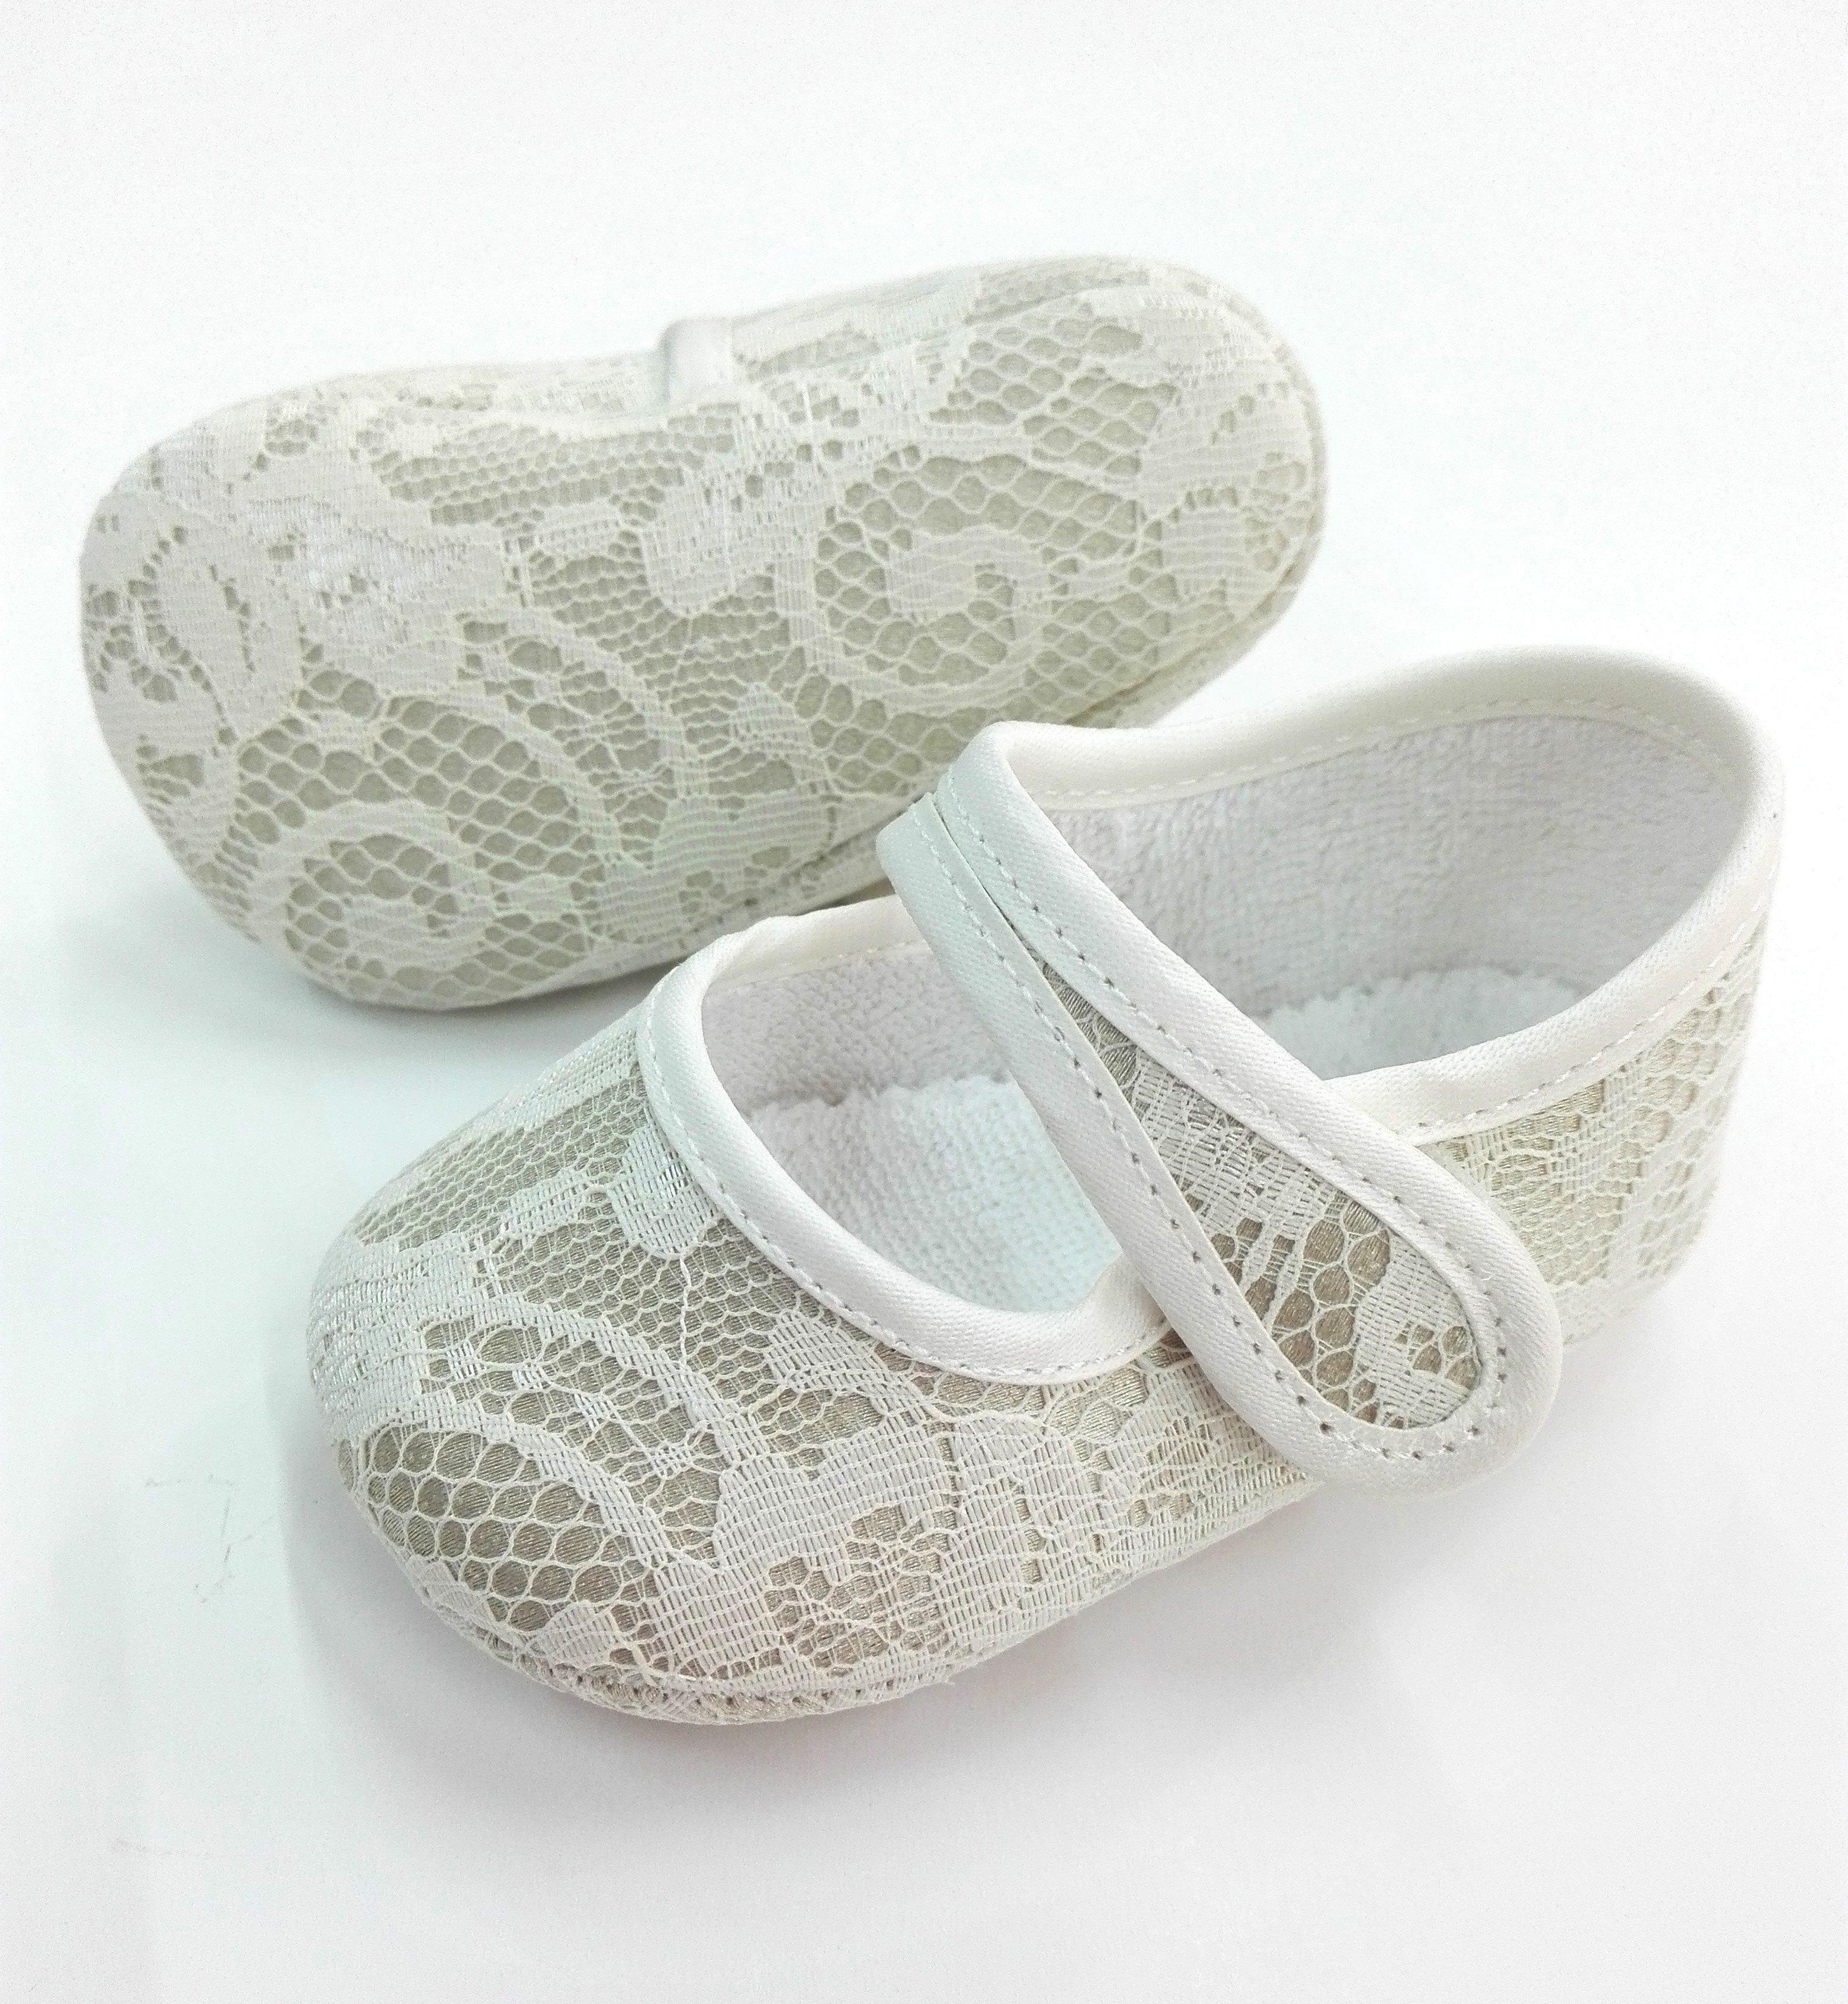 1c2ffee0 Zapato niña encaje beige - Arca Boutique Infantil-Juvenil